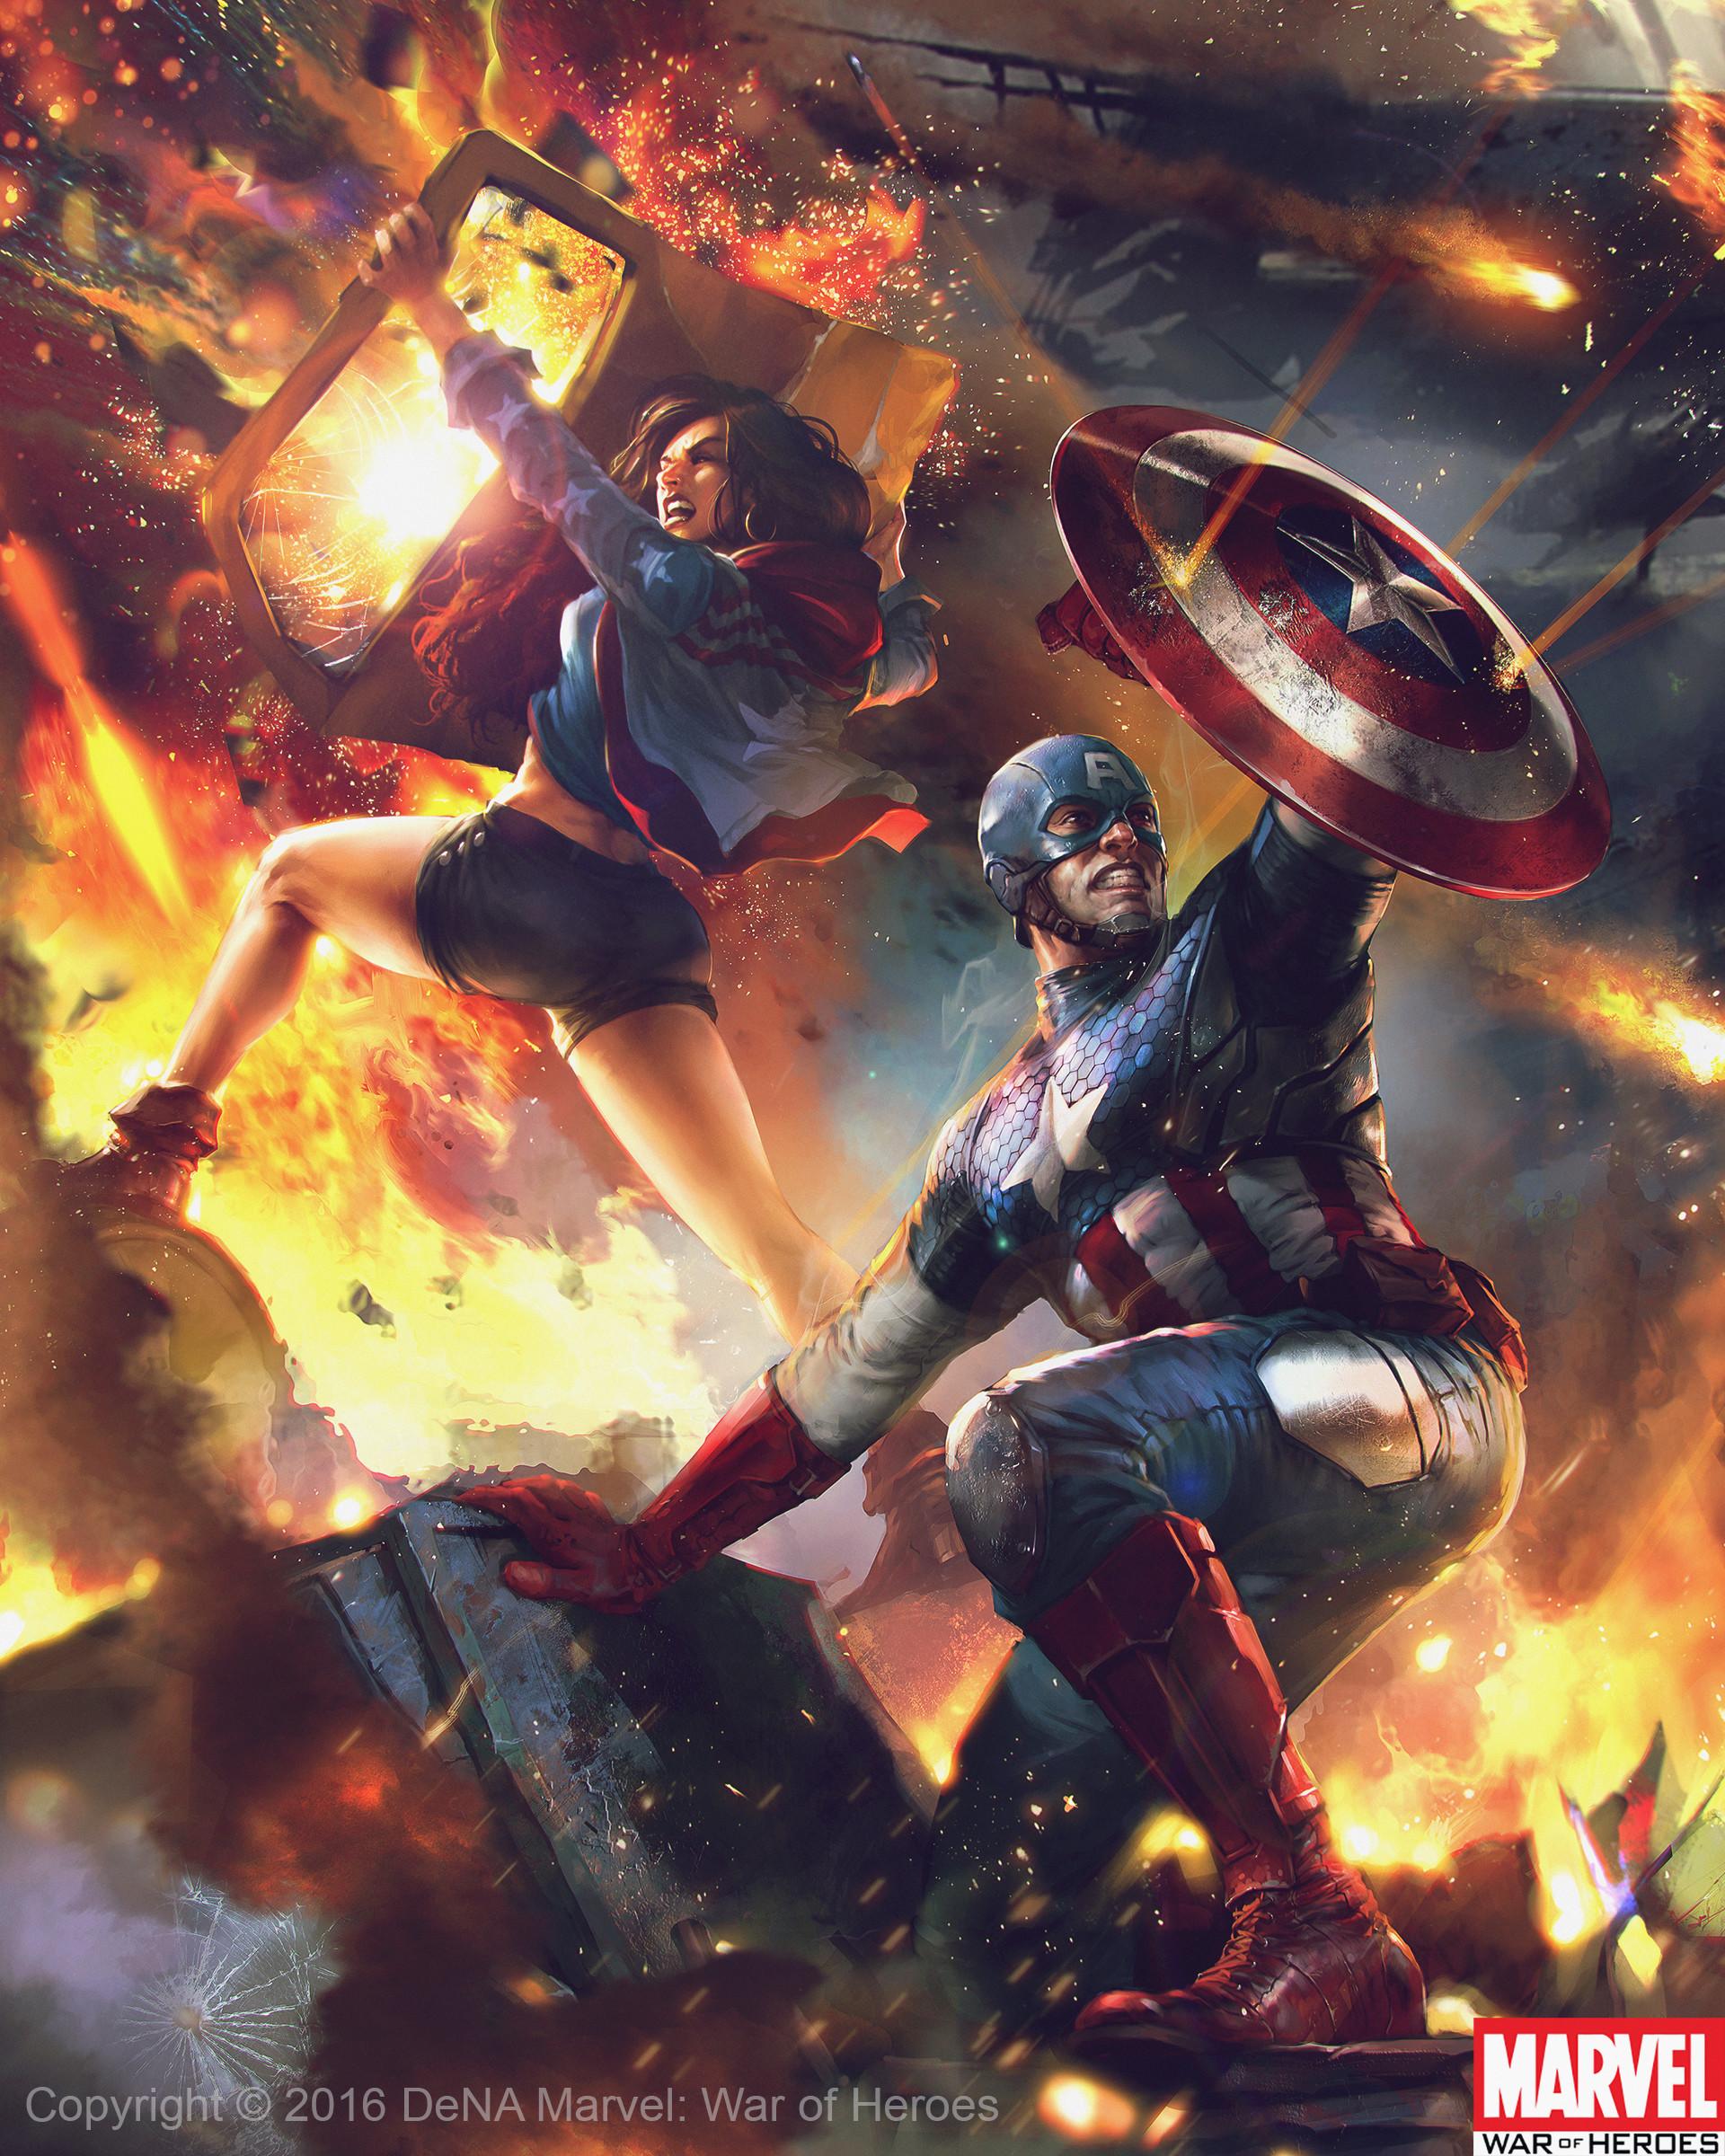 Denys tsiperko captainamerica and americachavez evo2 1